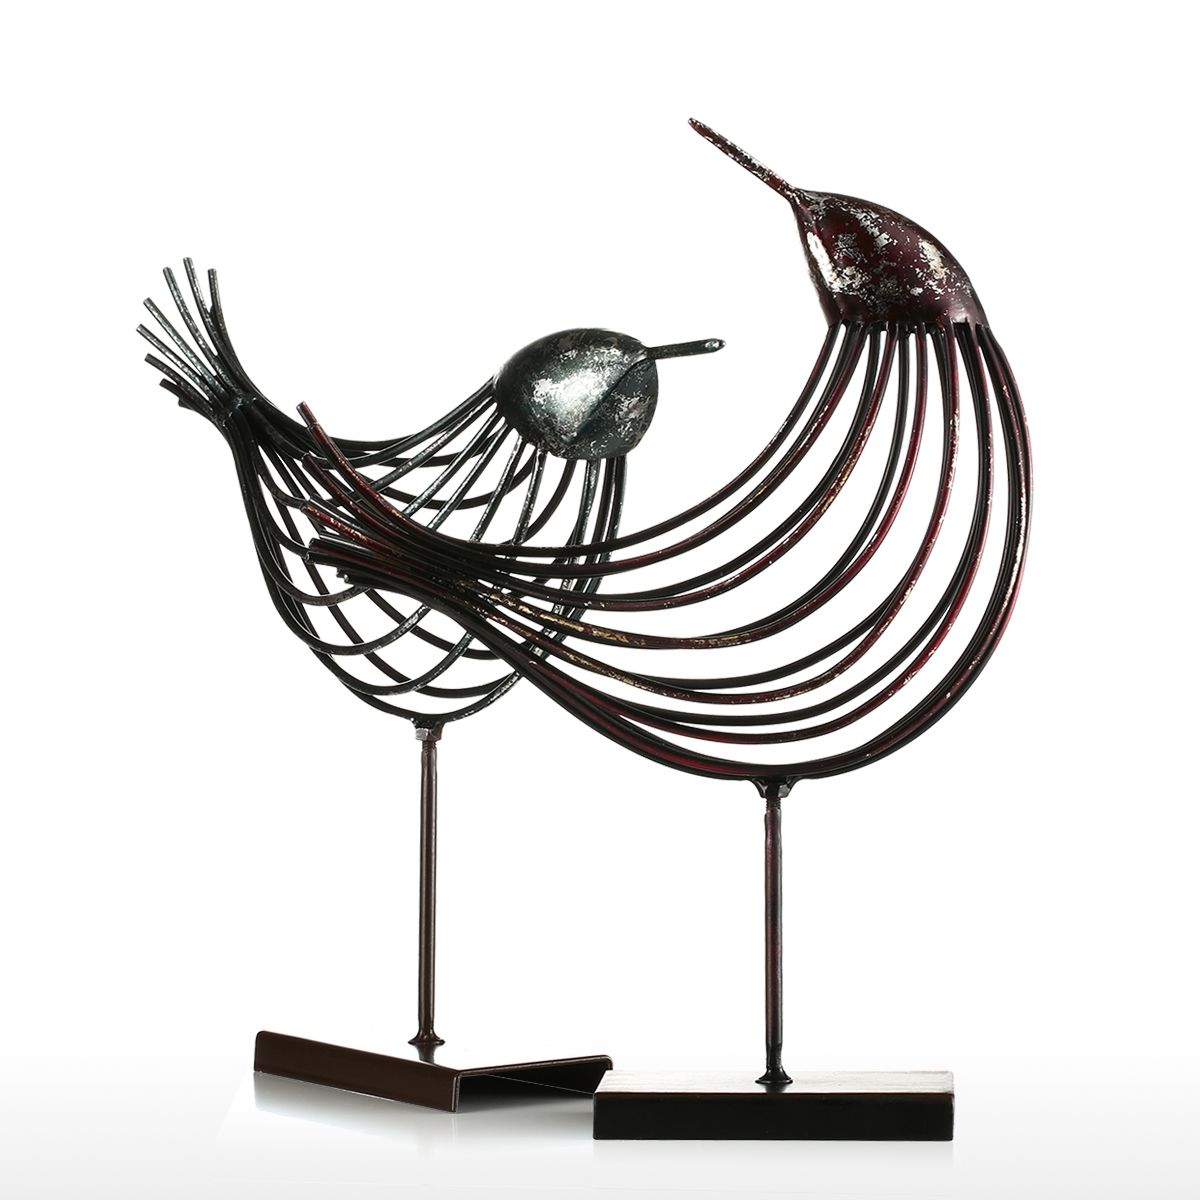 Tooarts Iron Wire Bird Metal Sculpture Wonderful Sculpture Bird Modern Artwork Favor Gift Home Decoration Decorative Decorative Decorative Home Decordecoration Home Aliexpress